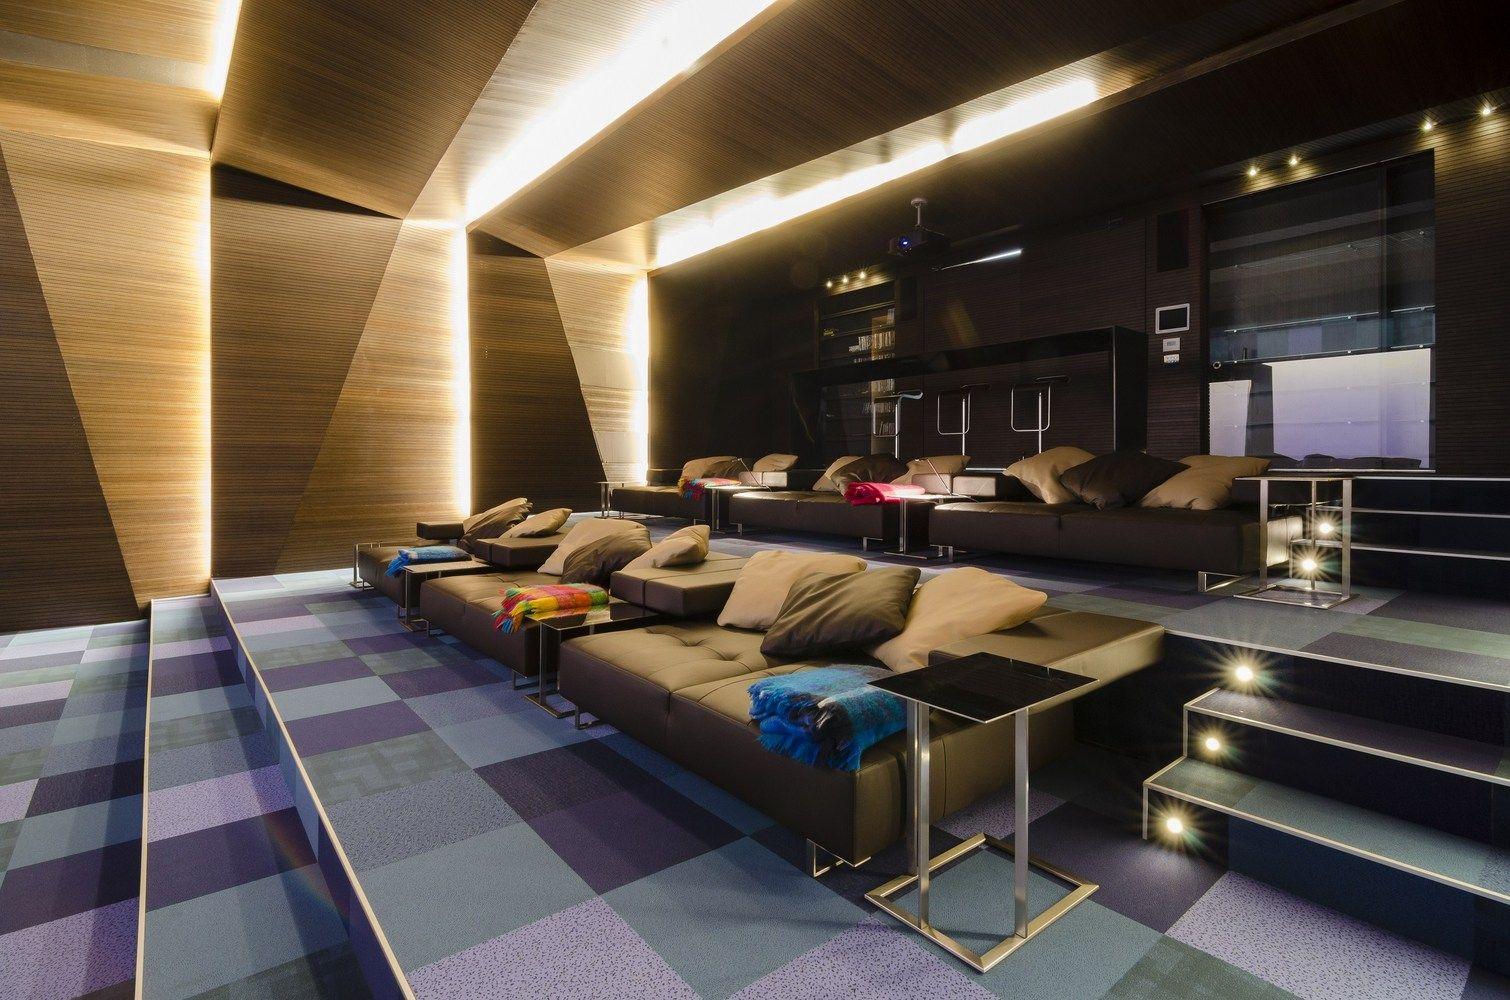 Muebles Sipo Dormitorio De Matrimonio De Dise O Moderno Serie  # Muebles Sipo Armarios